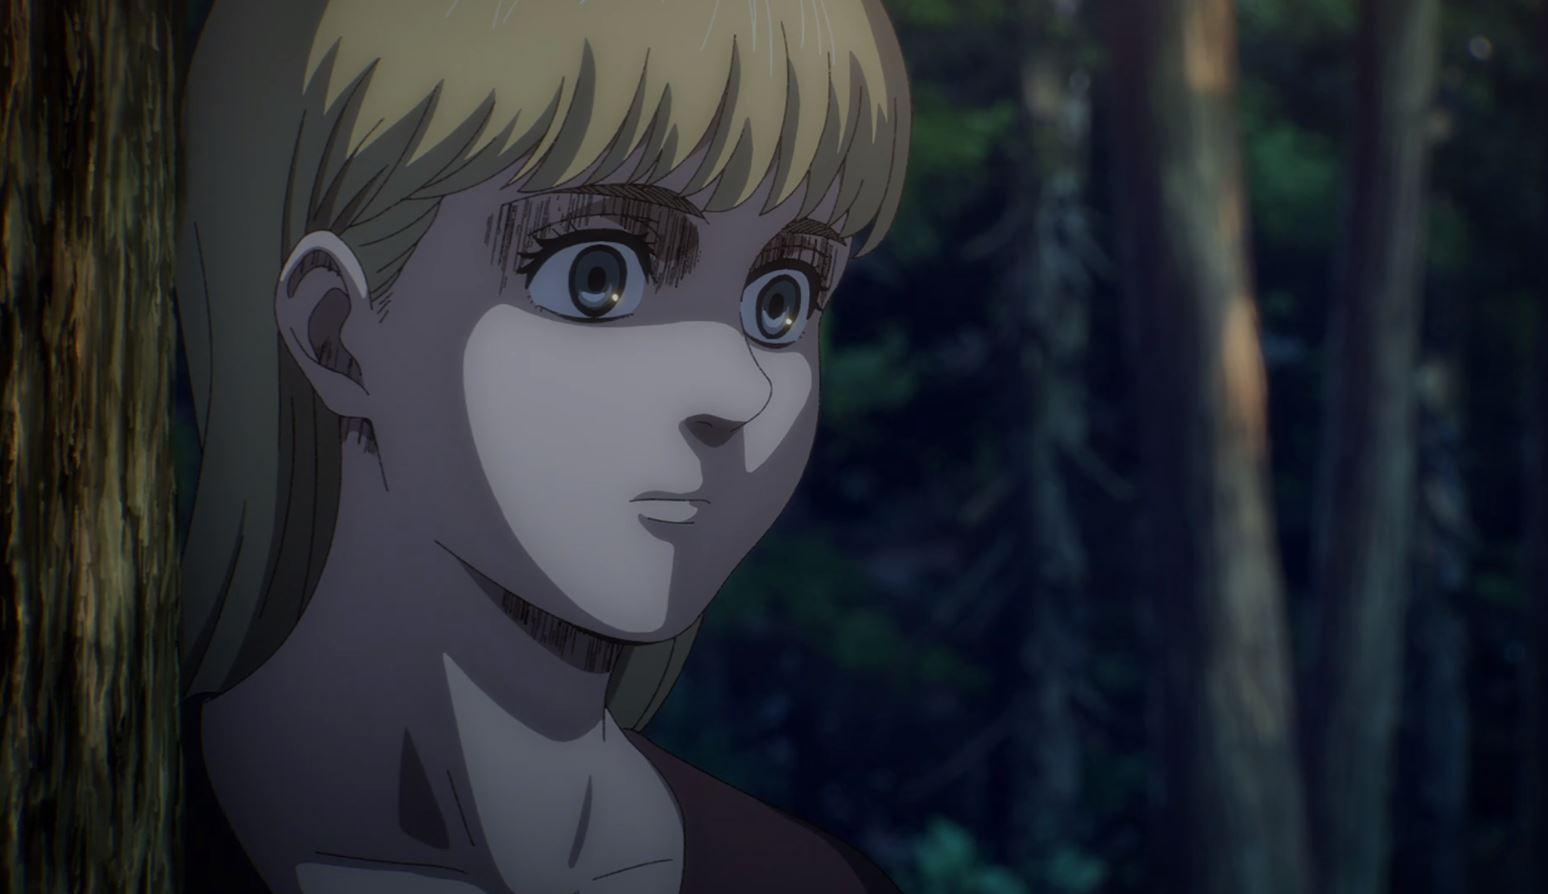 Attack on Titan Season 4 Episode 11 Ending Explained